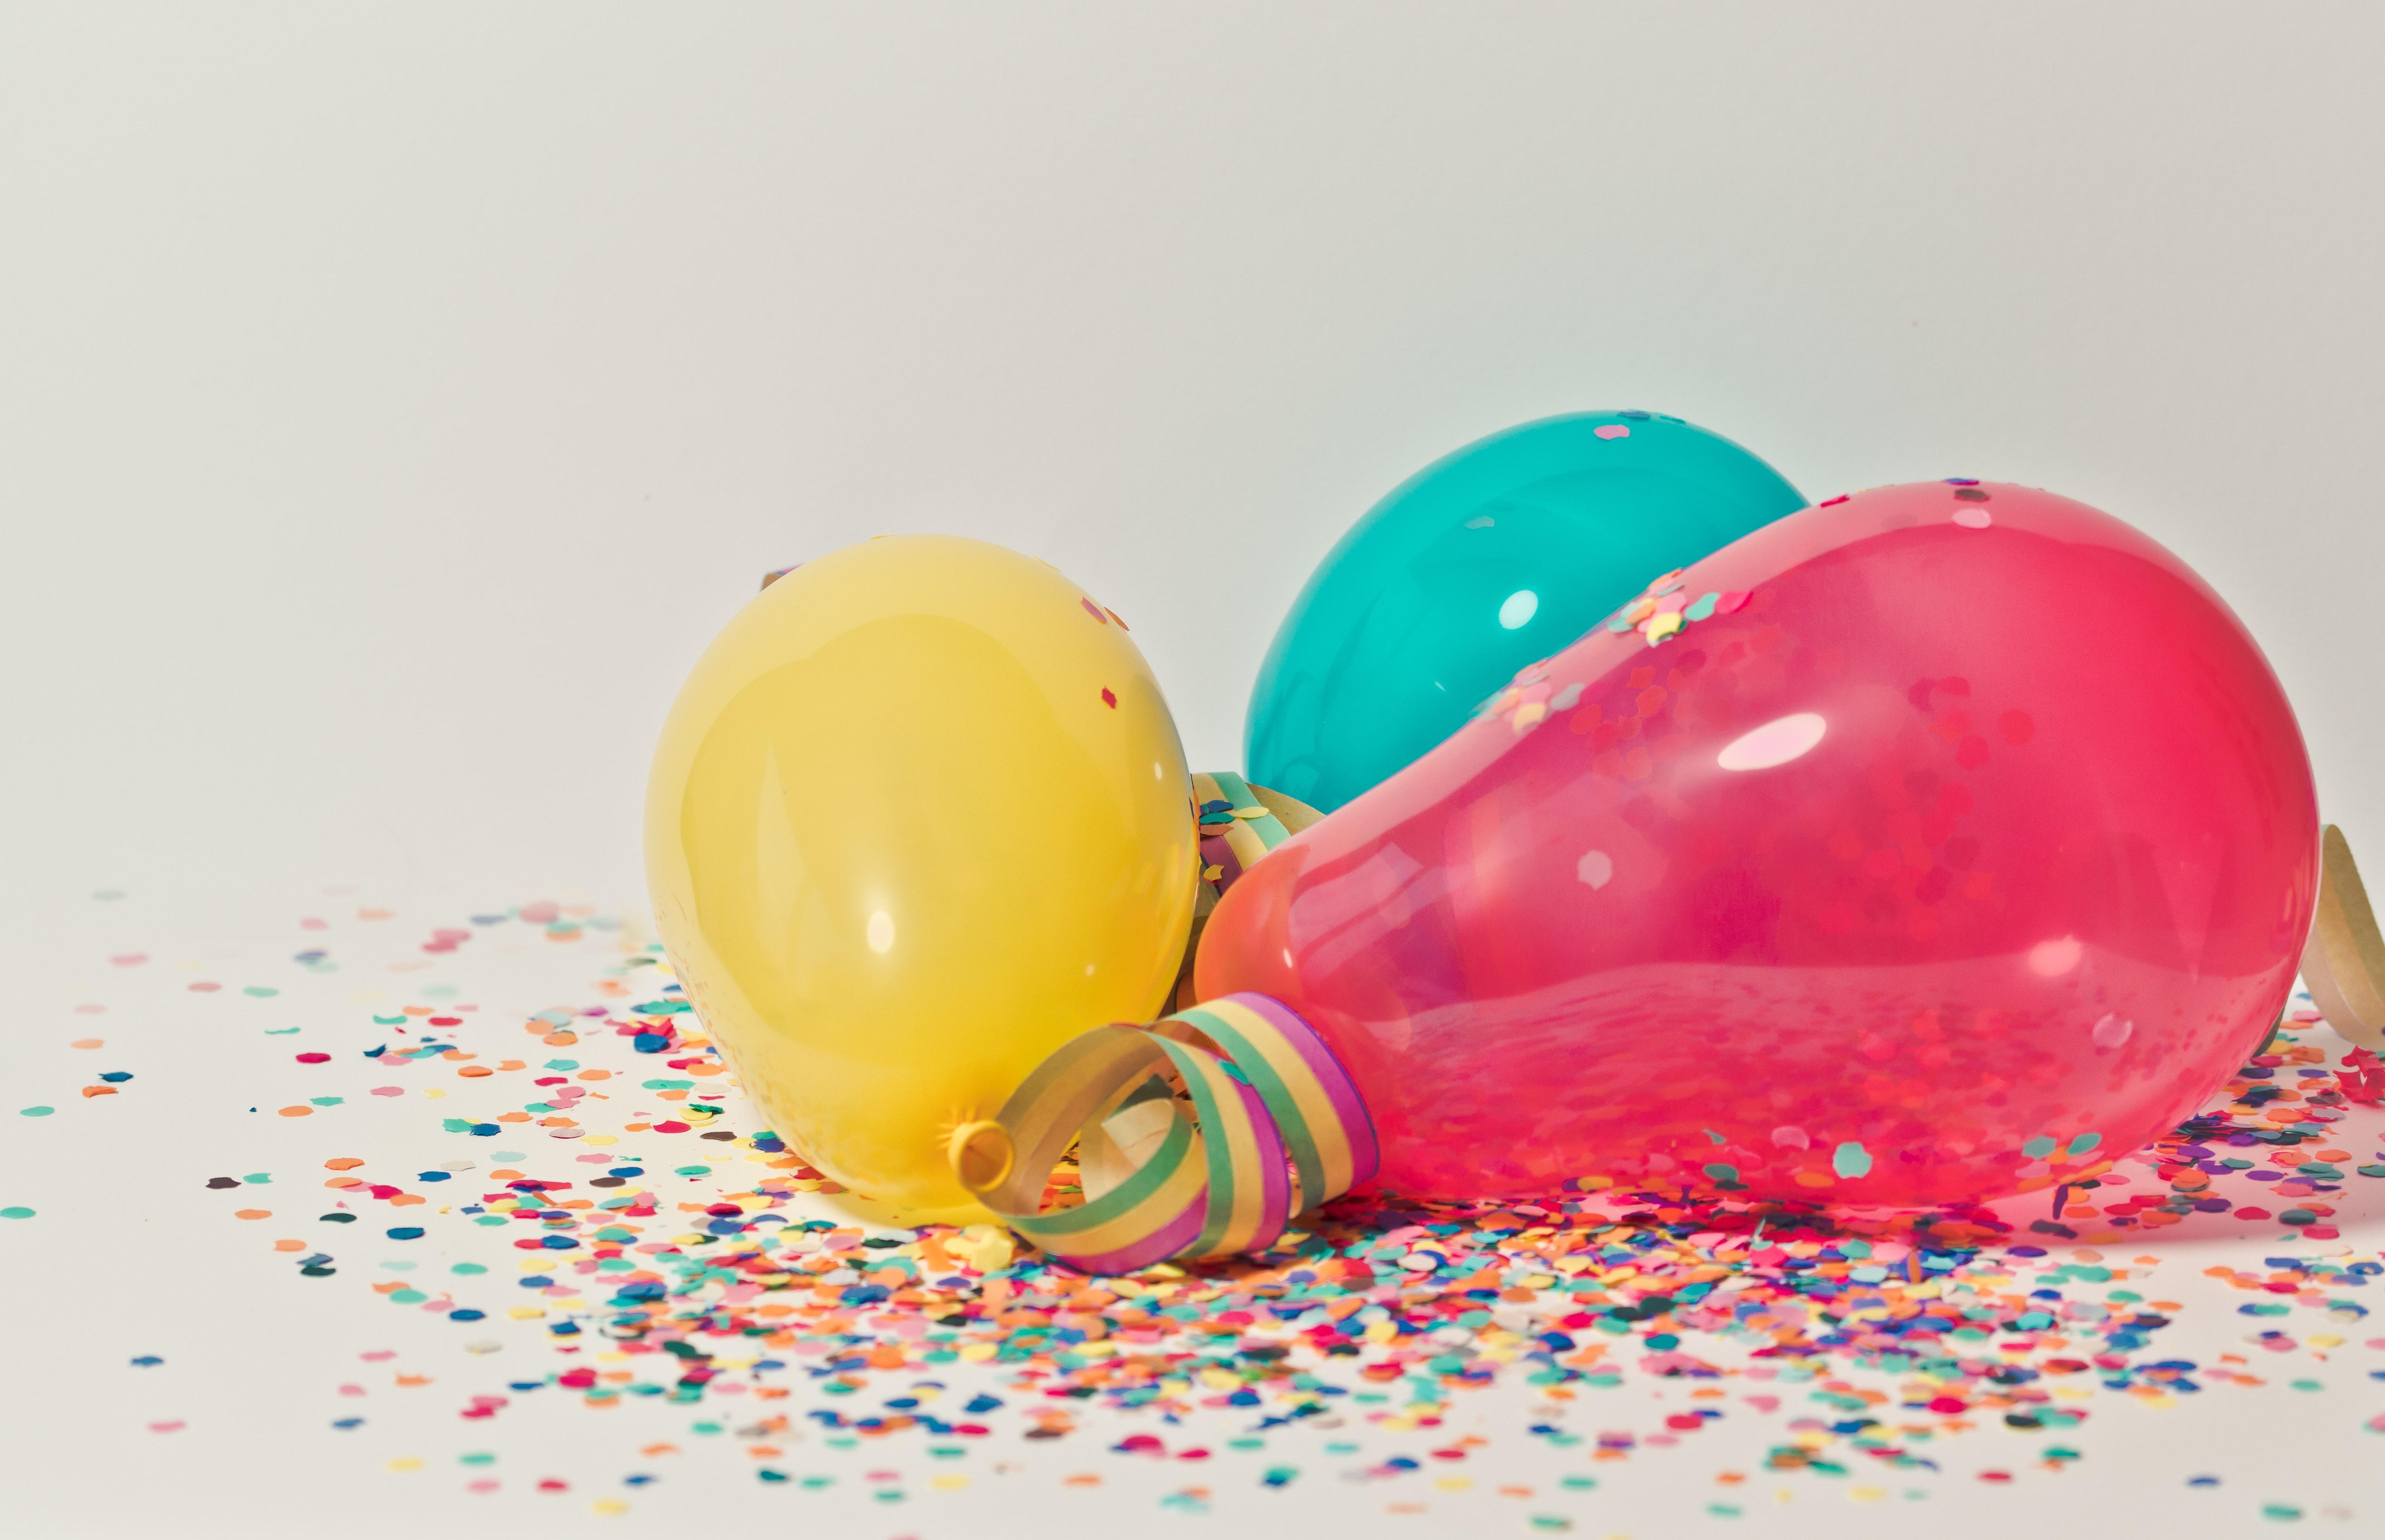 balloons-birthday-bright-796606